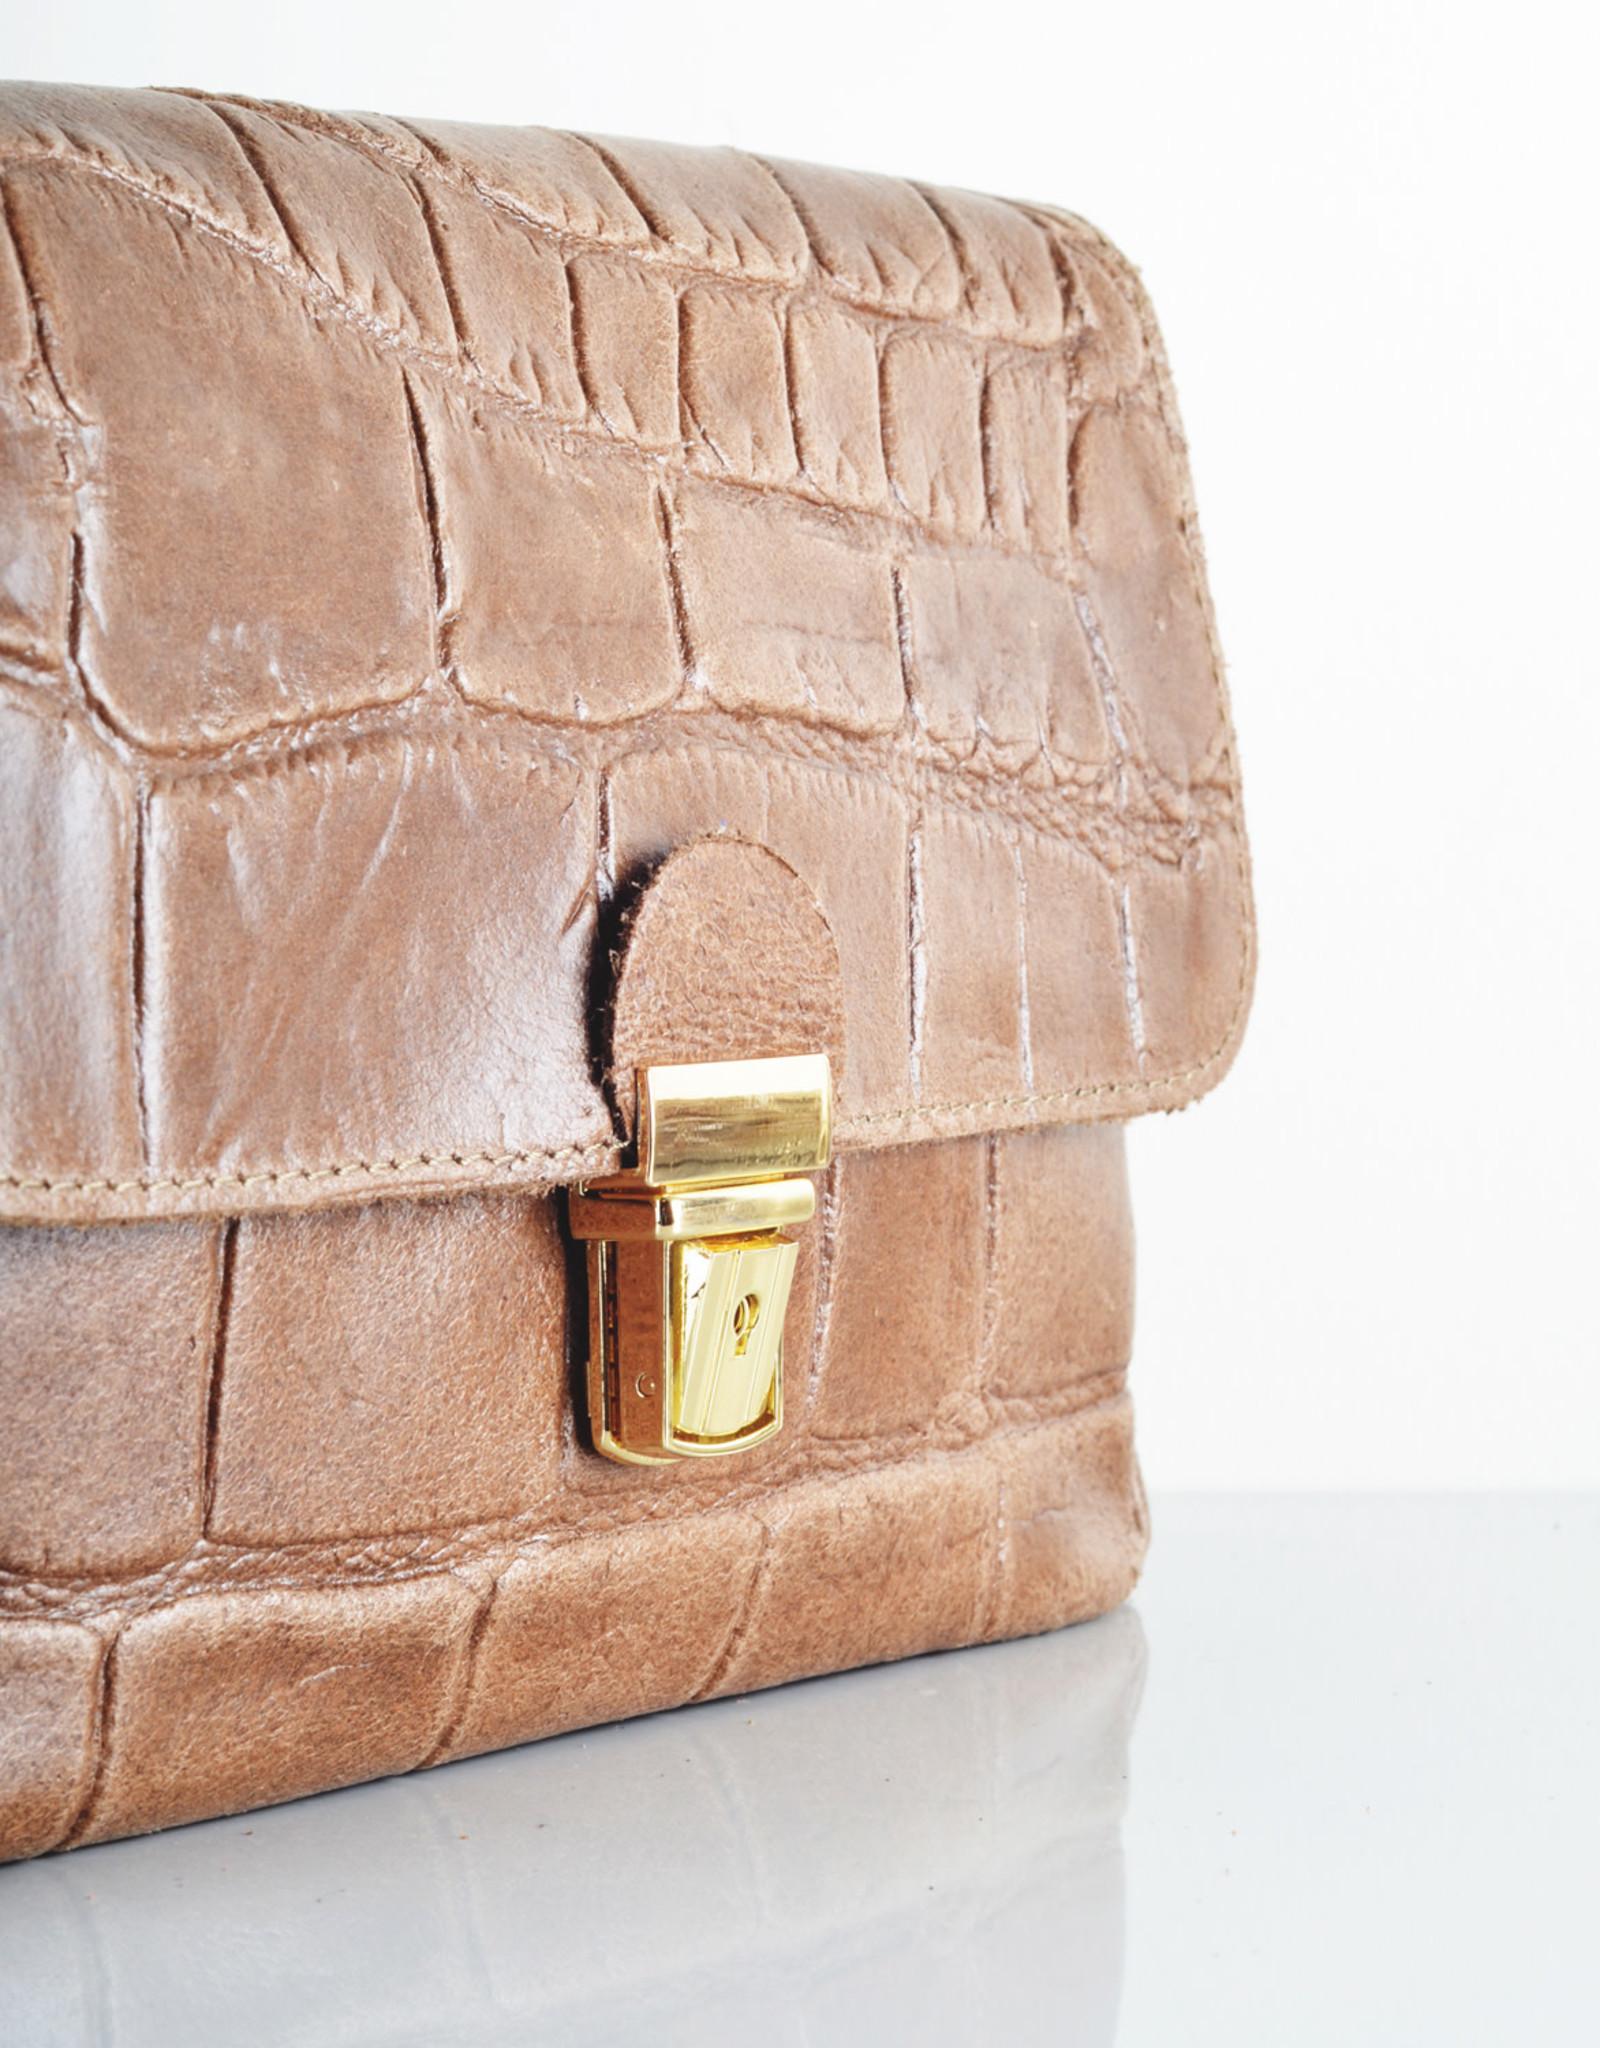 Croco gold bag brown